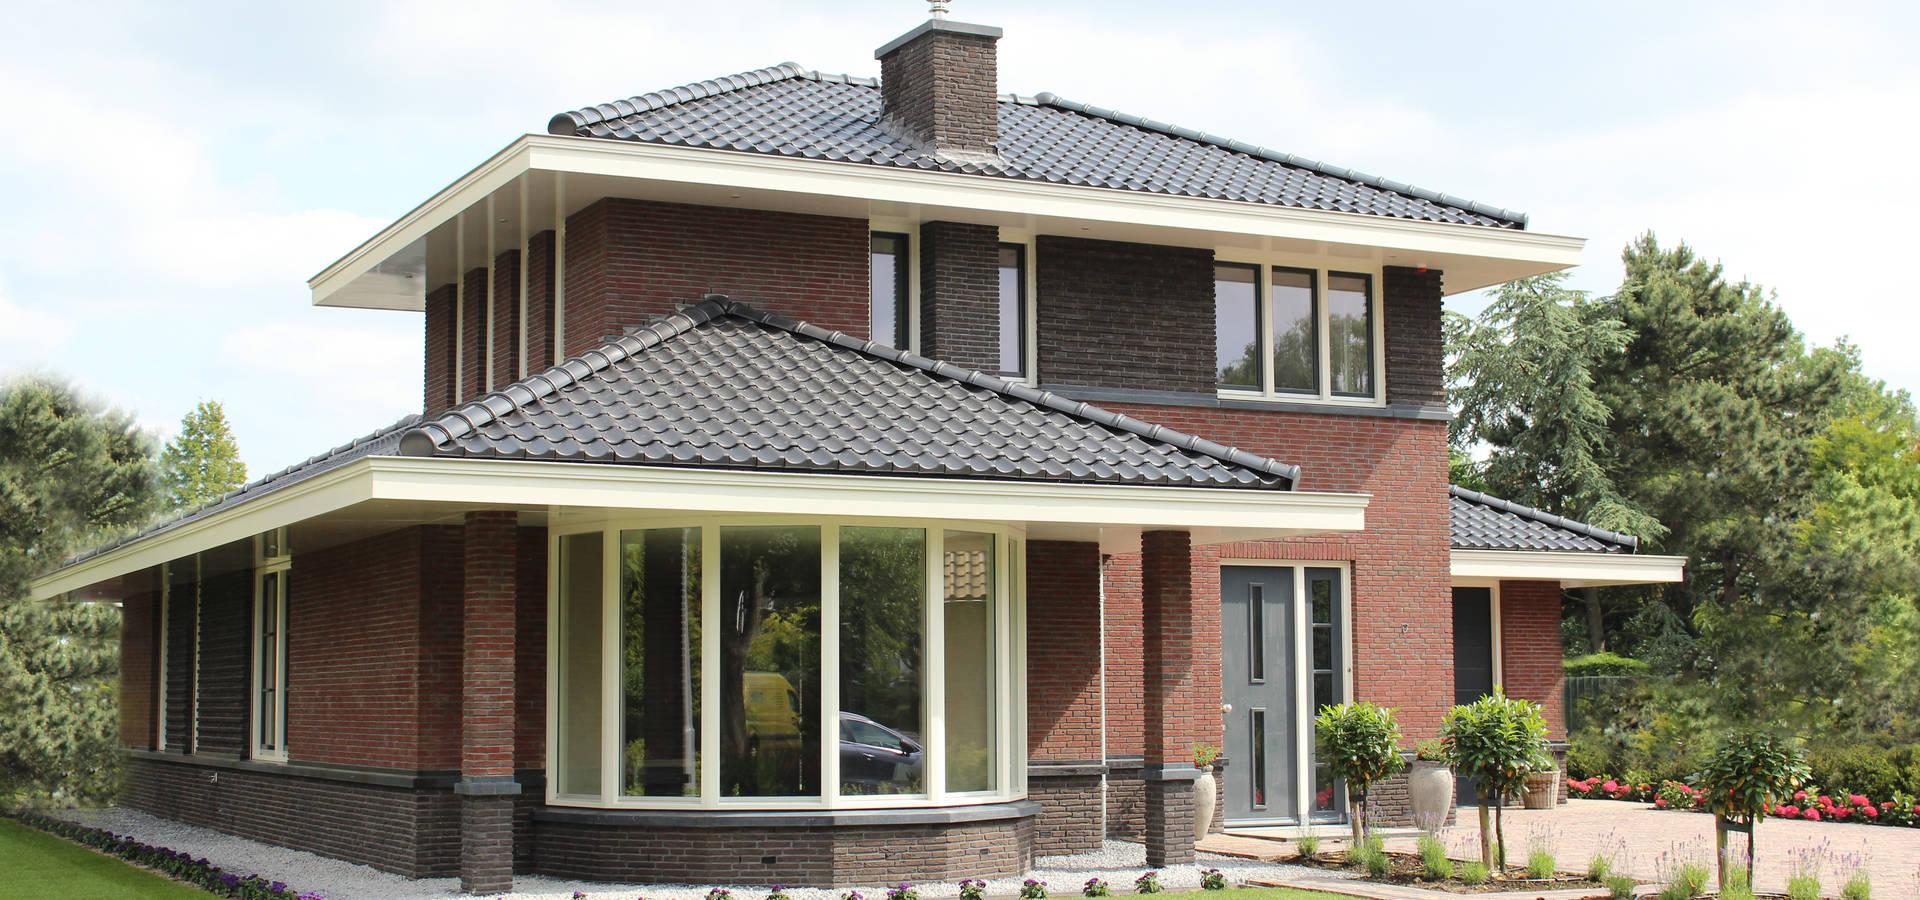 Kuiper Steur architecten BNA